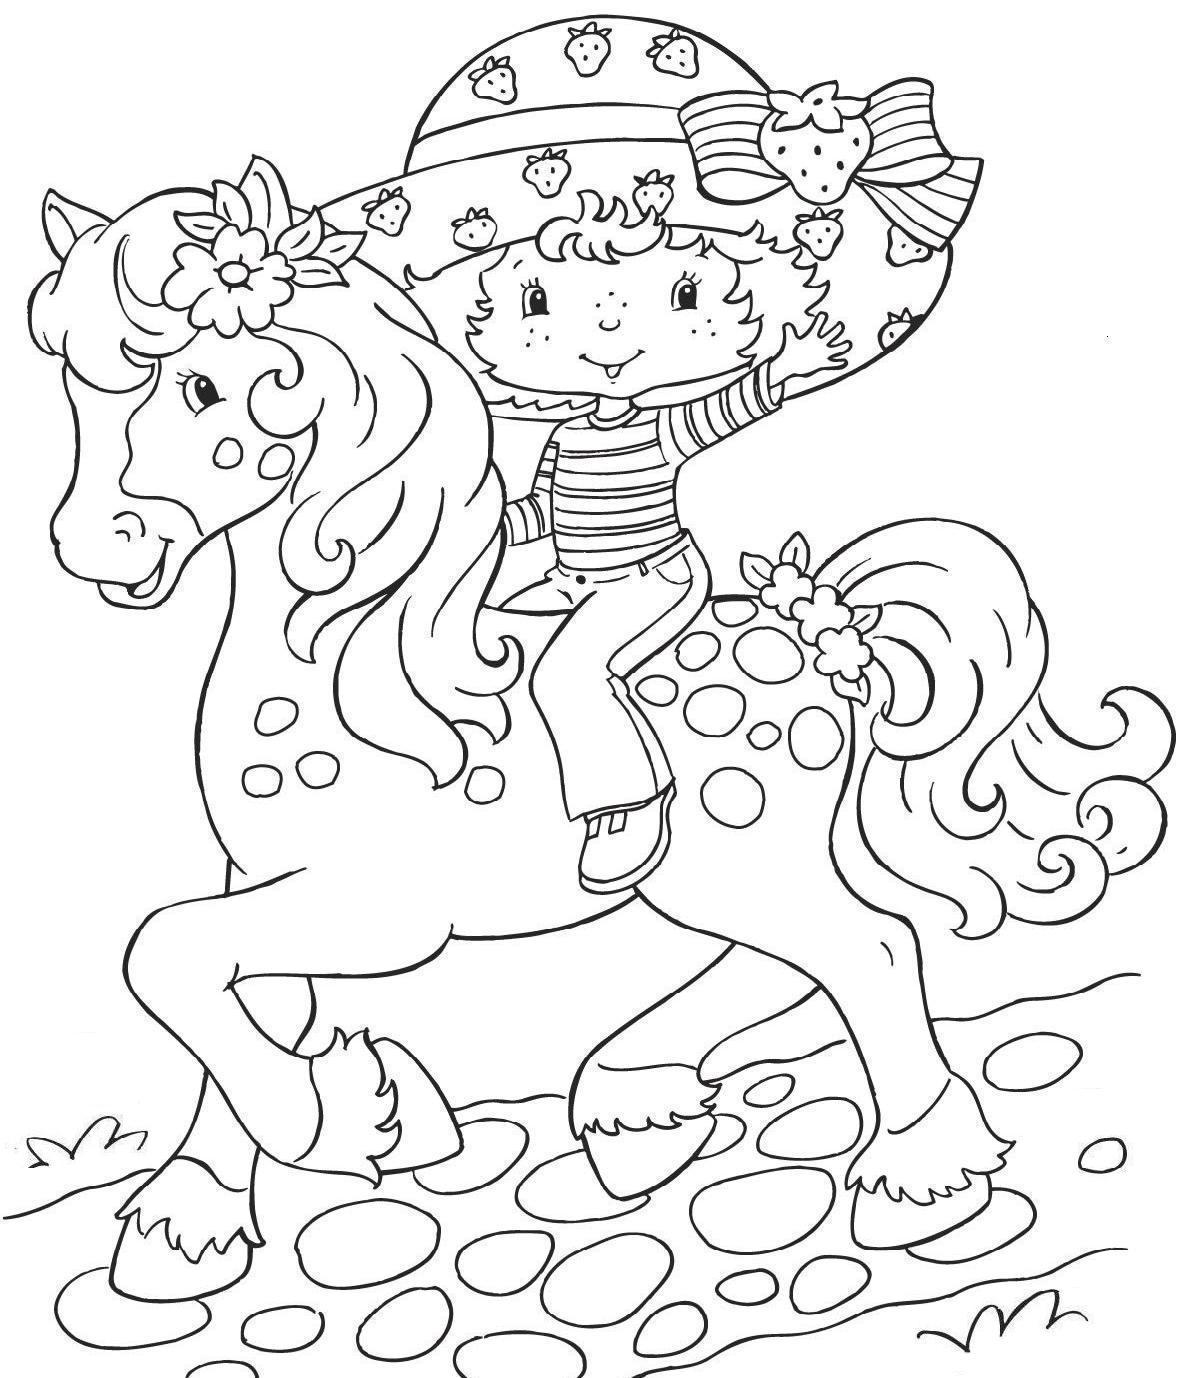 imagens para meninas para colorir bda polly